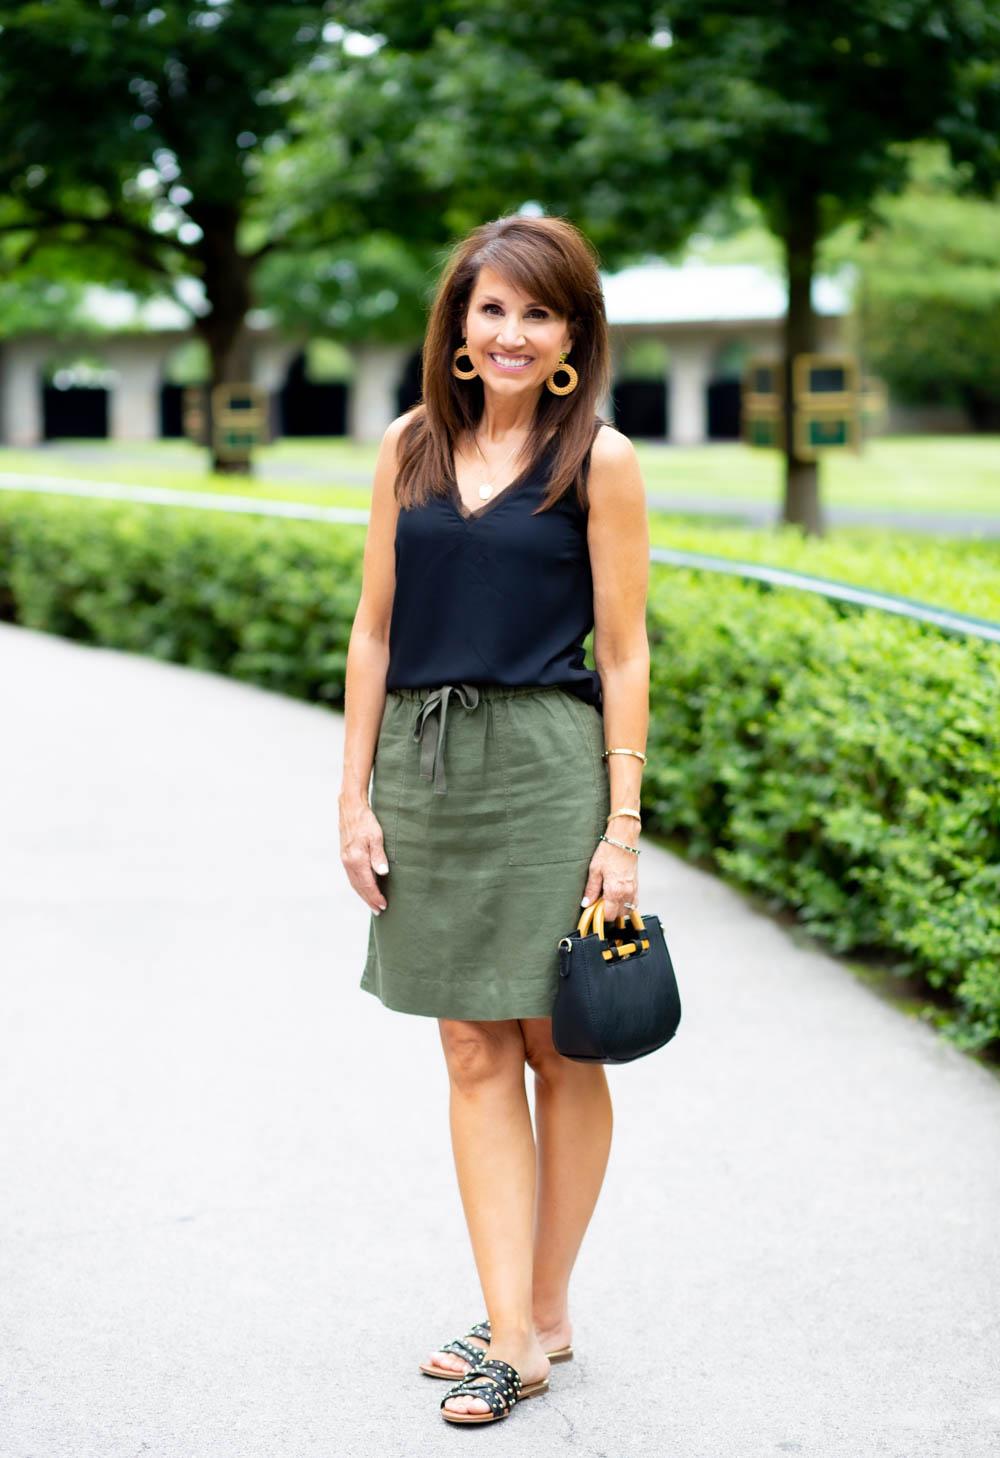 Black Tank and Olive Skirt